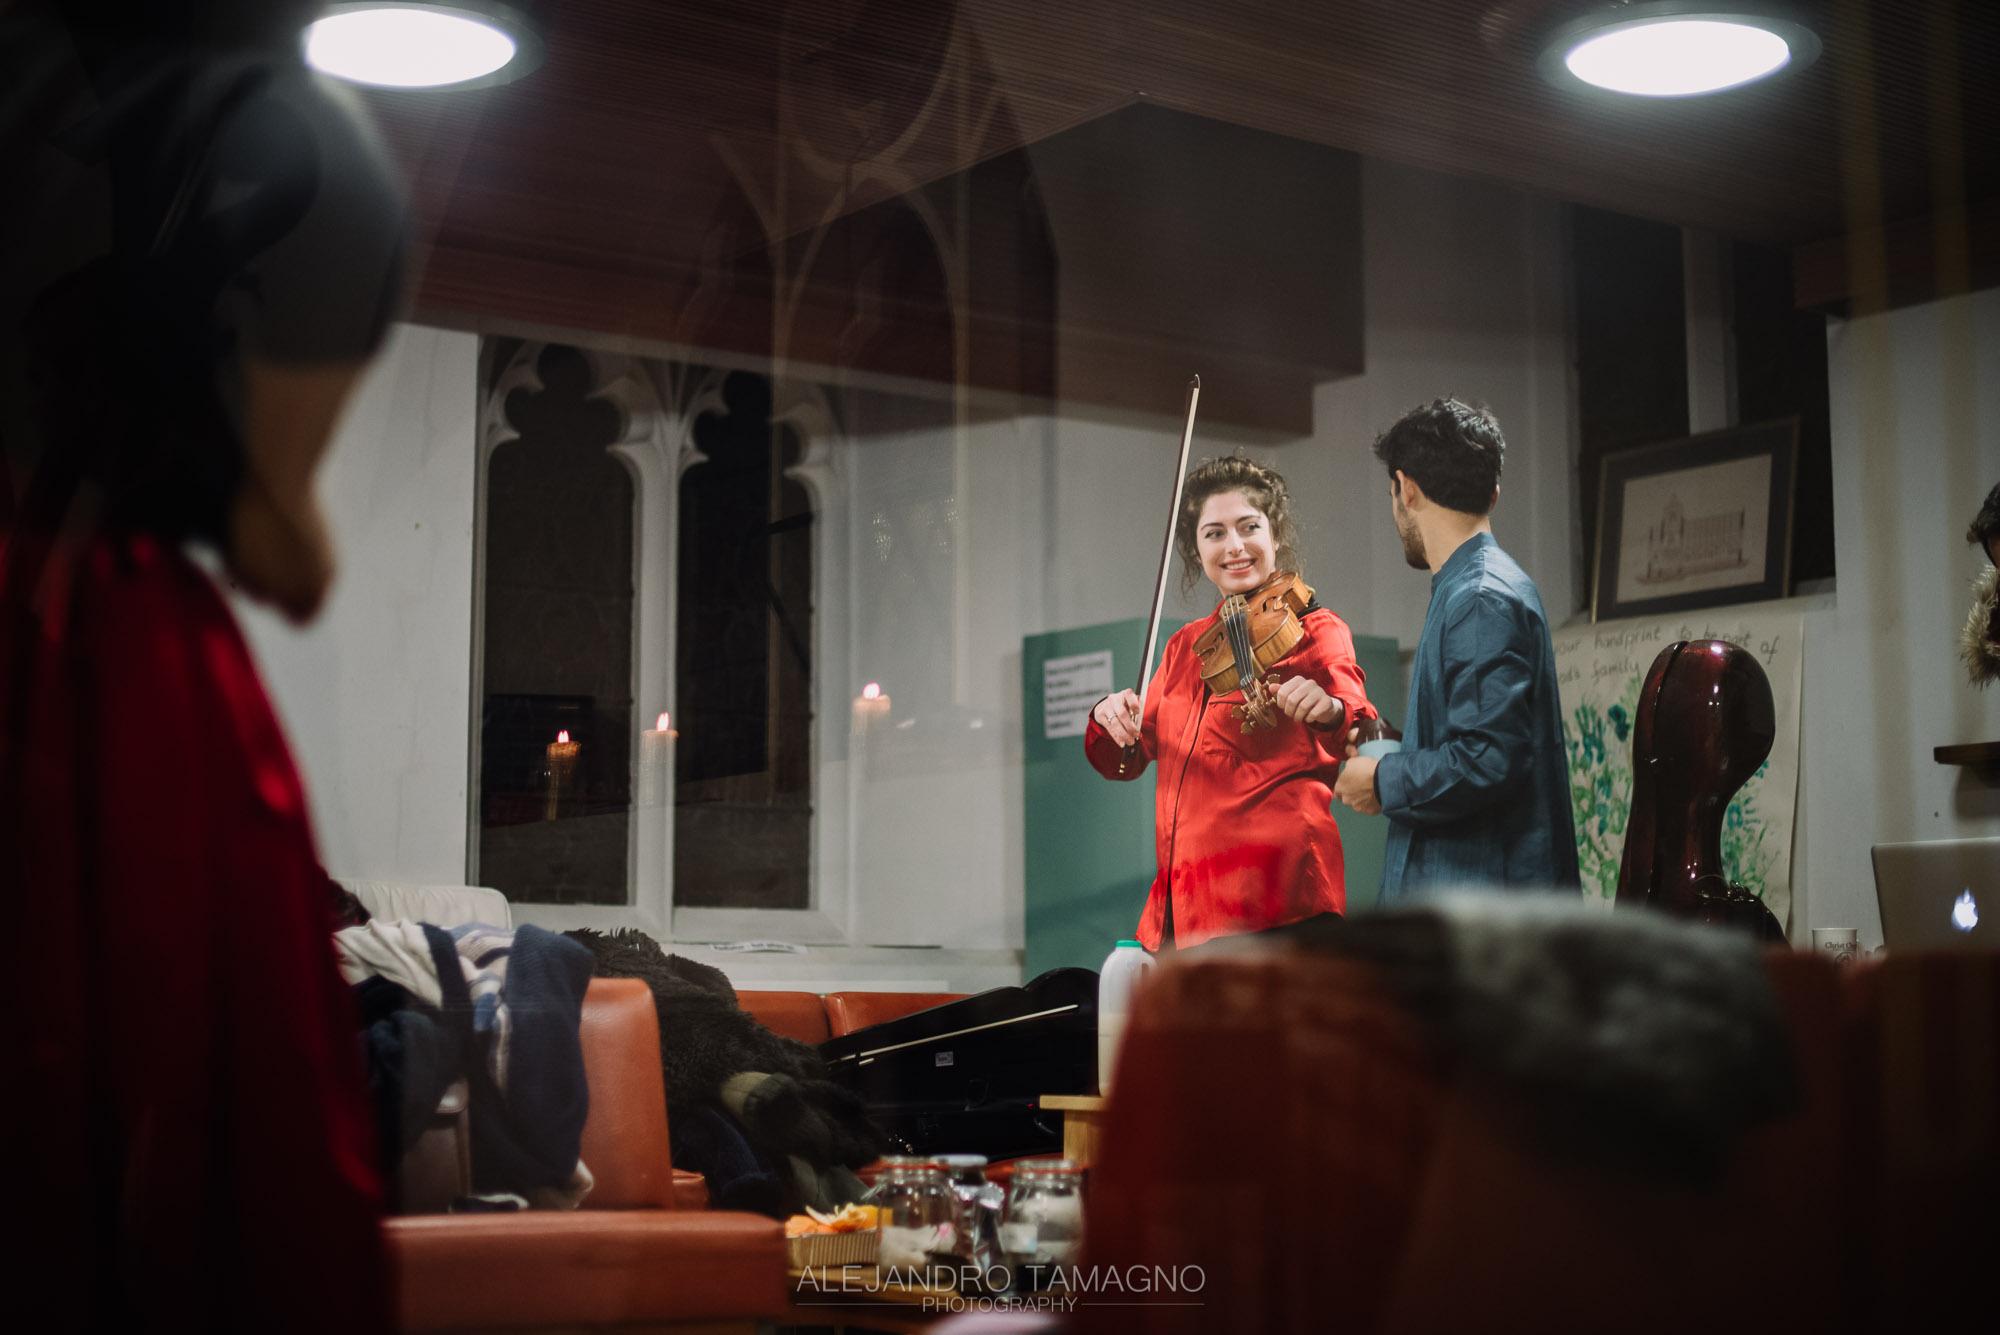 © Alejandro Tamagno 2017_ Jigsaw Player_Candlelight 02-12-2017 059.jpg